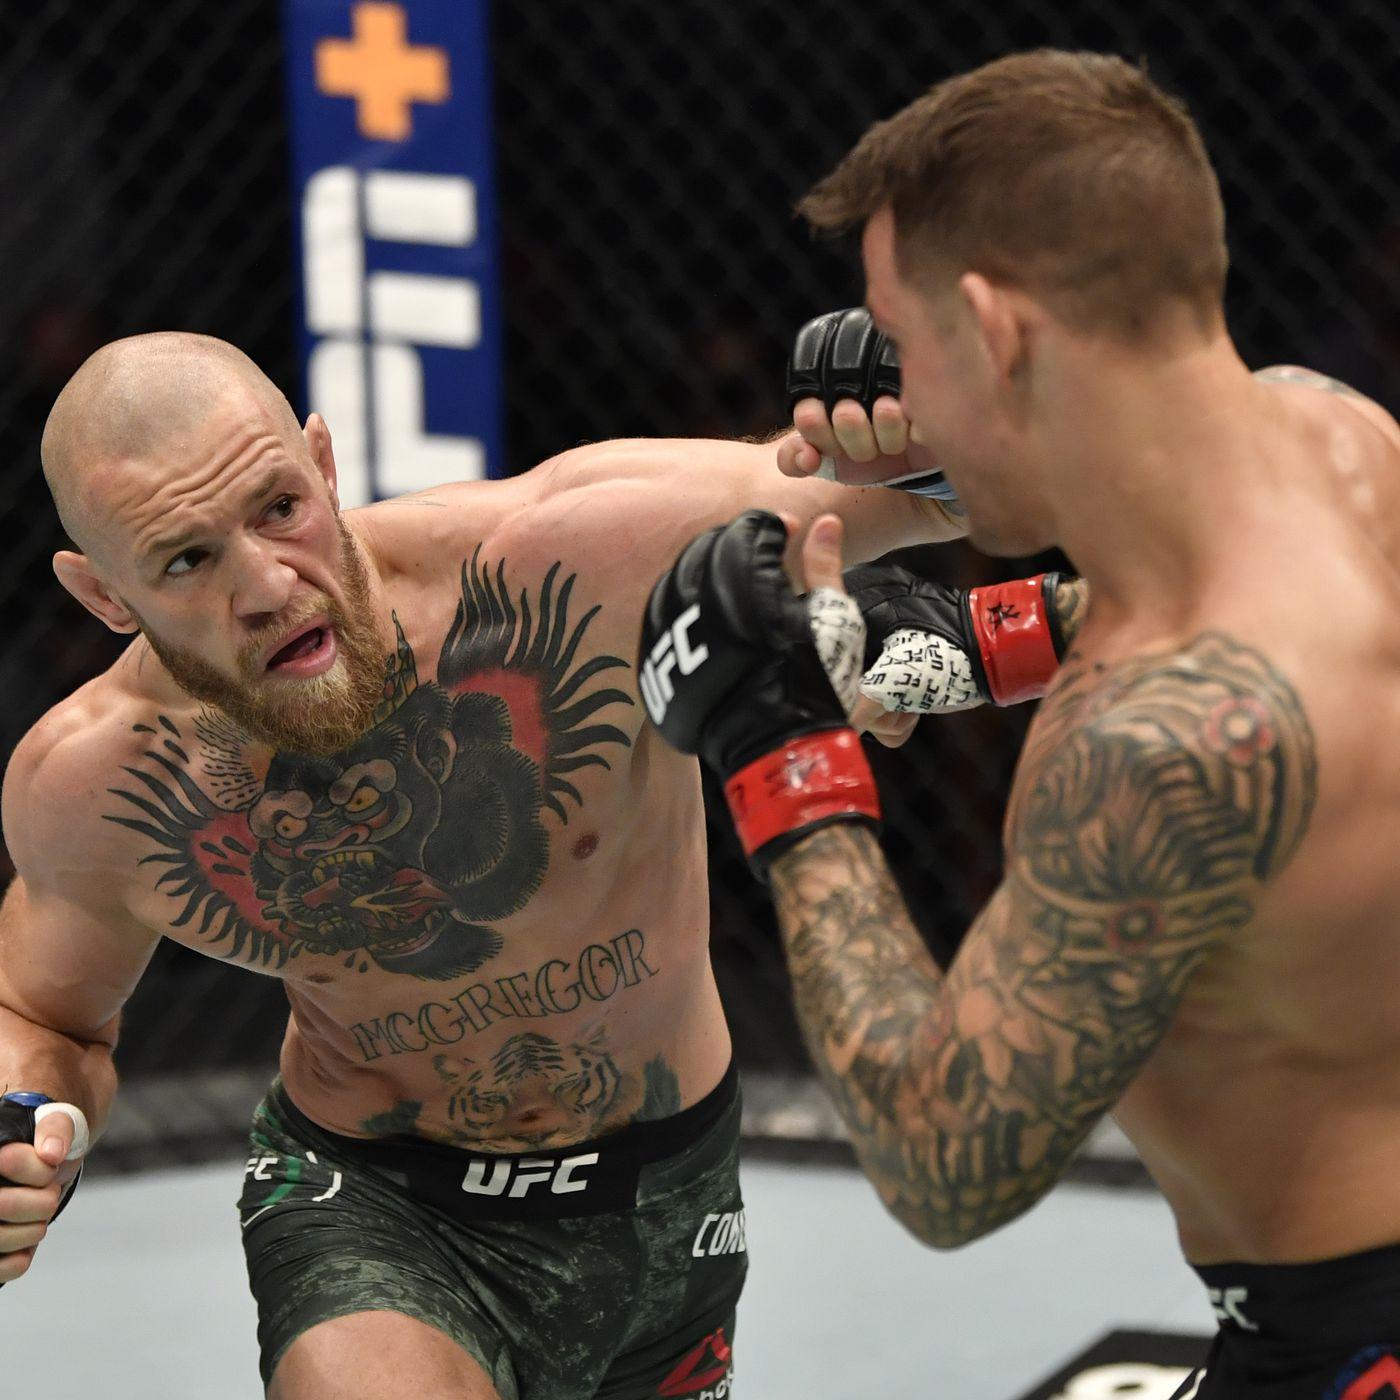 UFC 264: Poirier vs. McGregor 3 updates, news, fight card - MMA Fighting